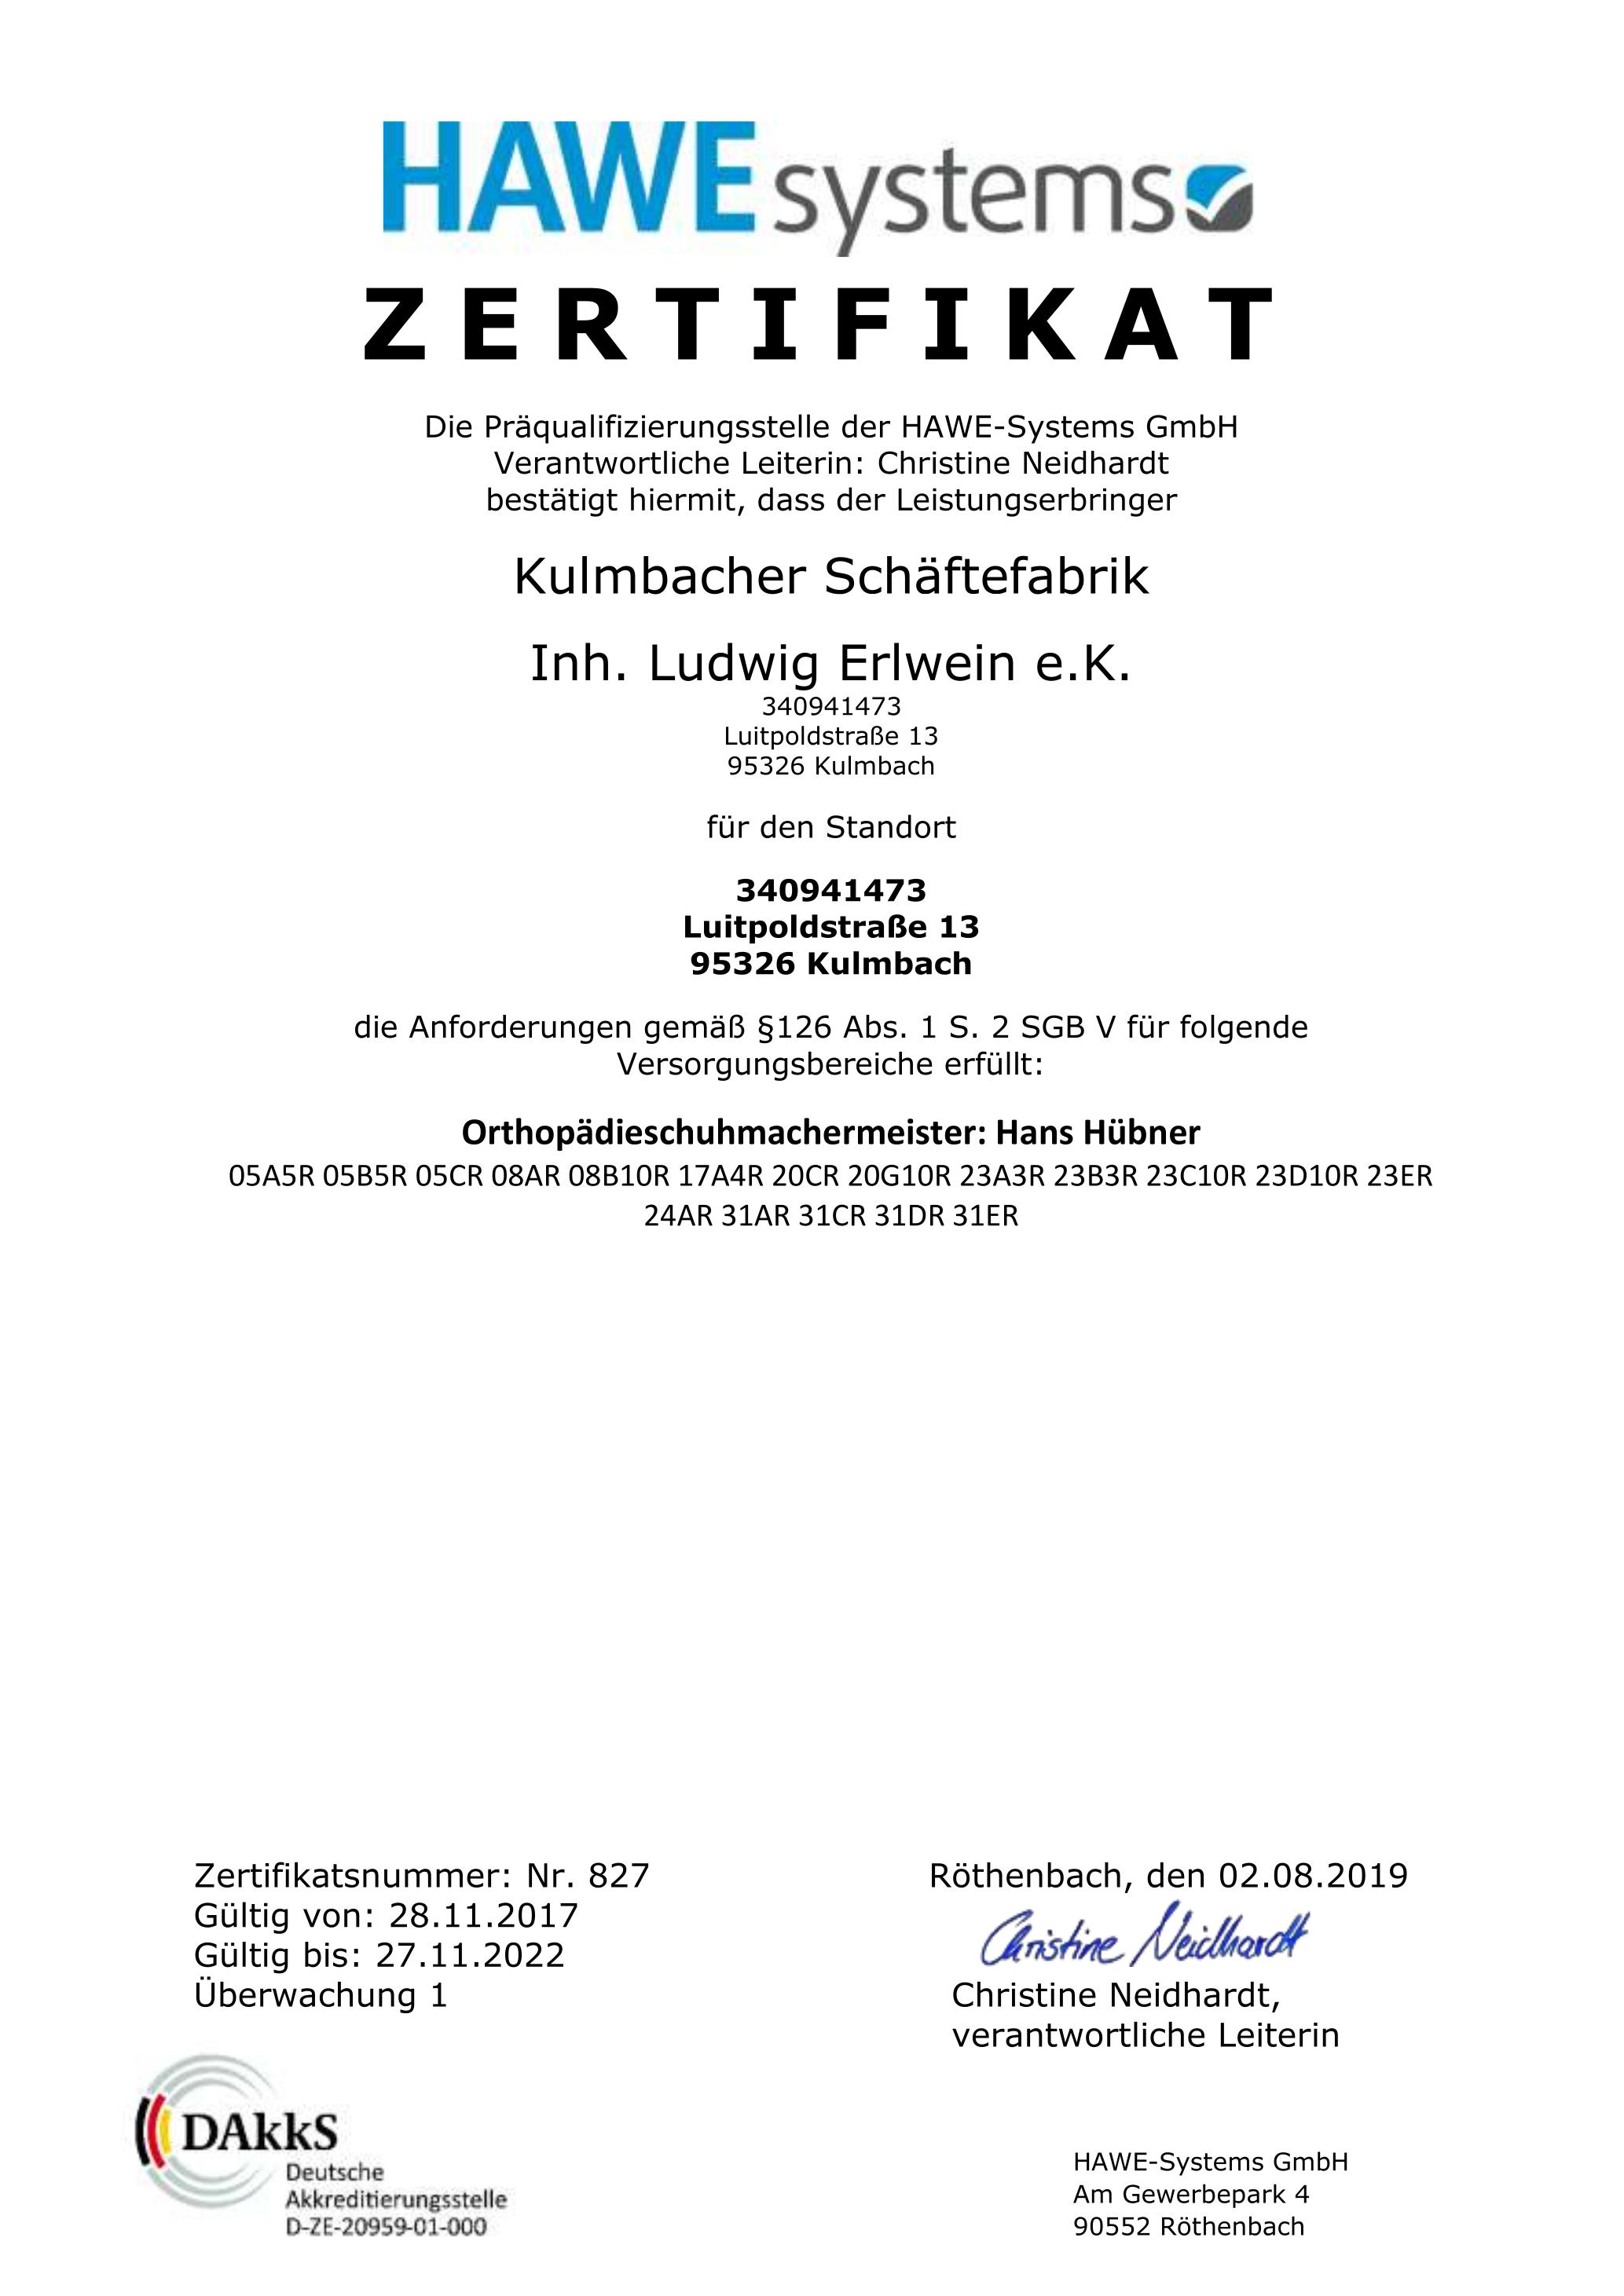 Zertifikat Präqualifizierung Kulmbacher Schäftefabrik 2019